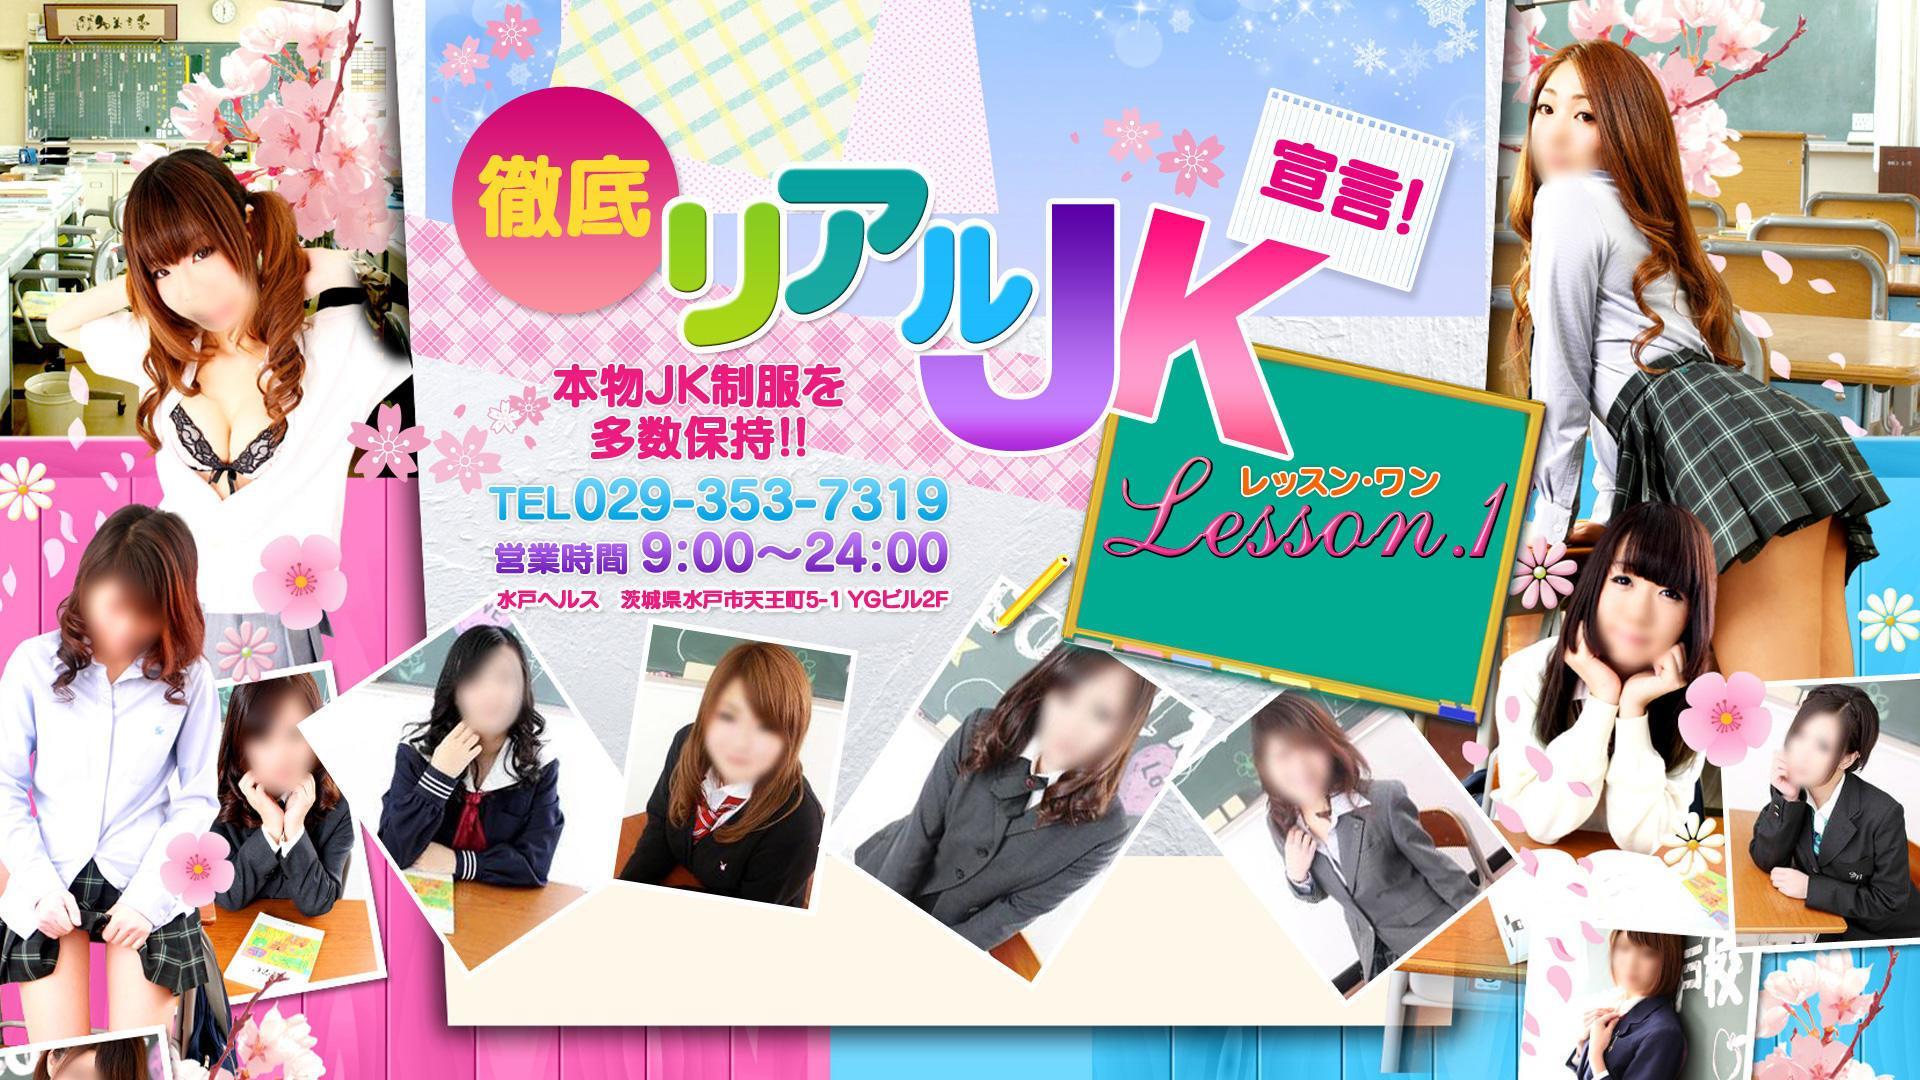 Lesson.1 水戸校(YESグループ)